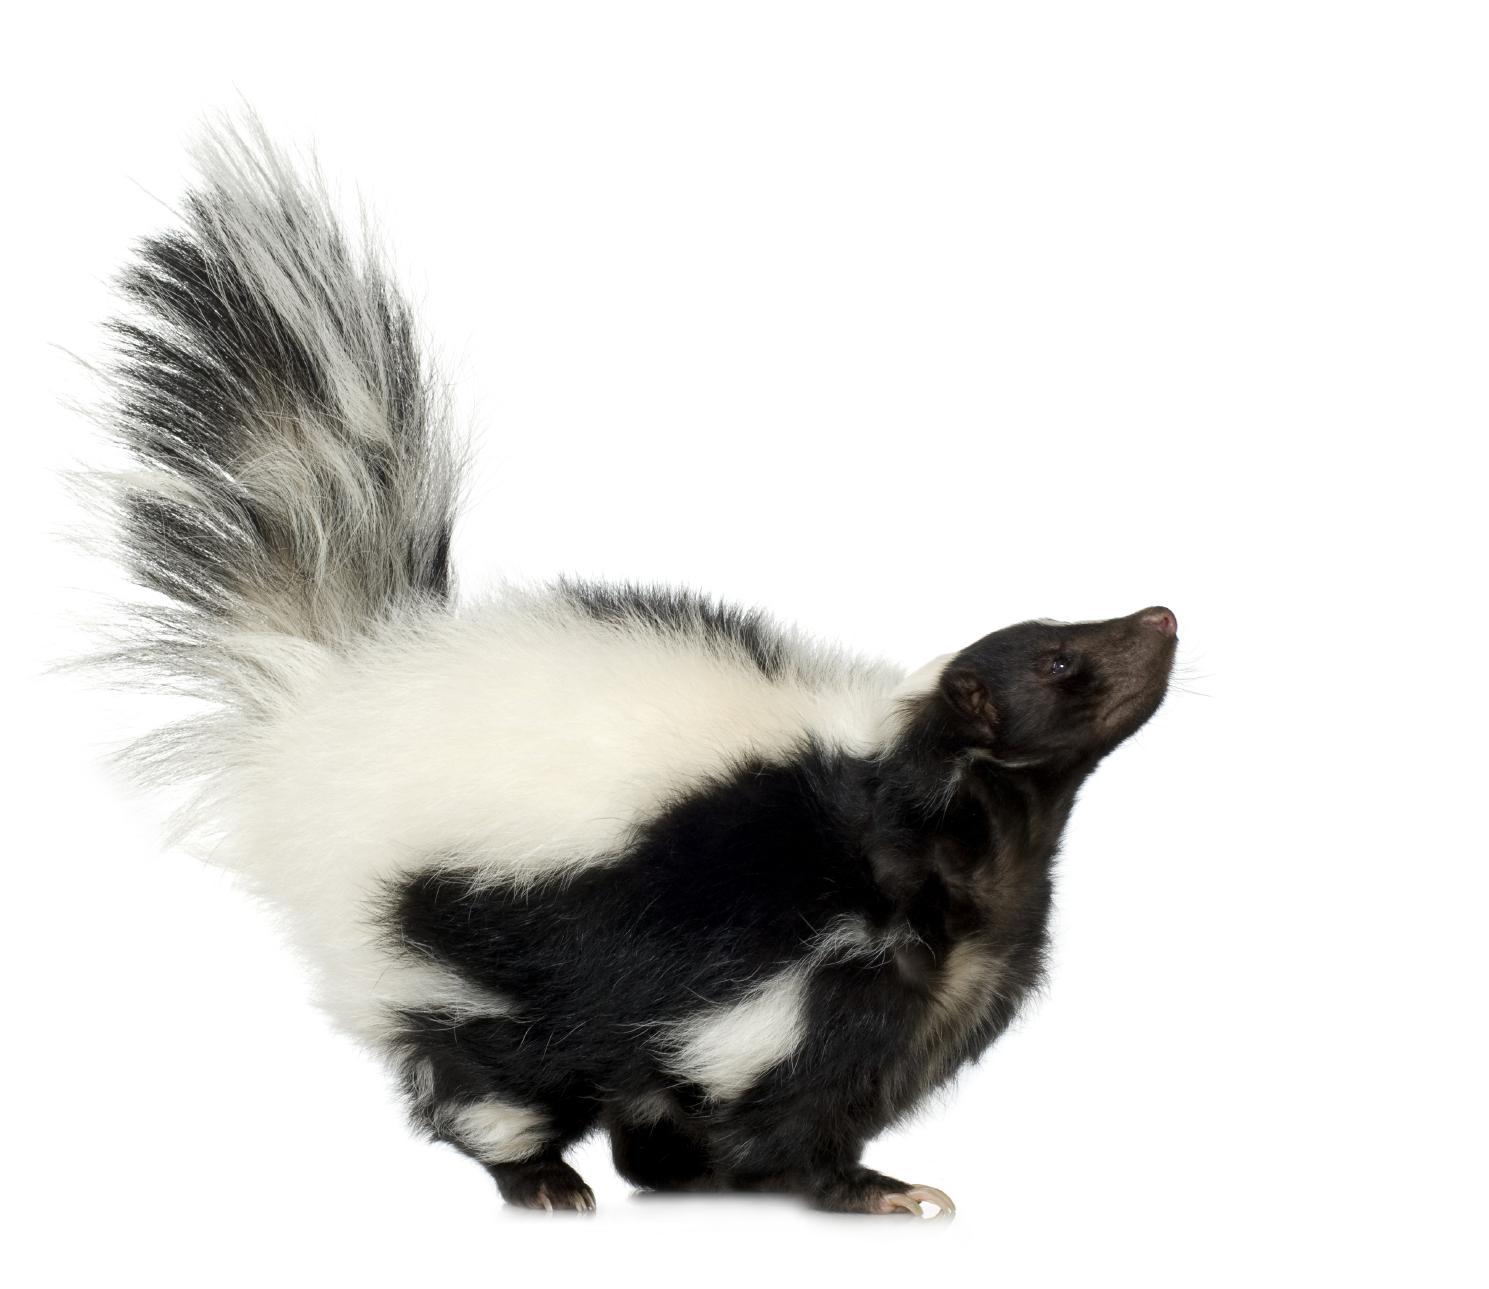 Skunk PNG - 17736